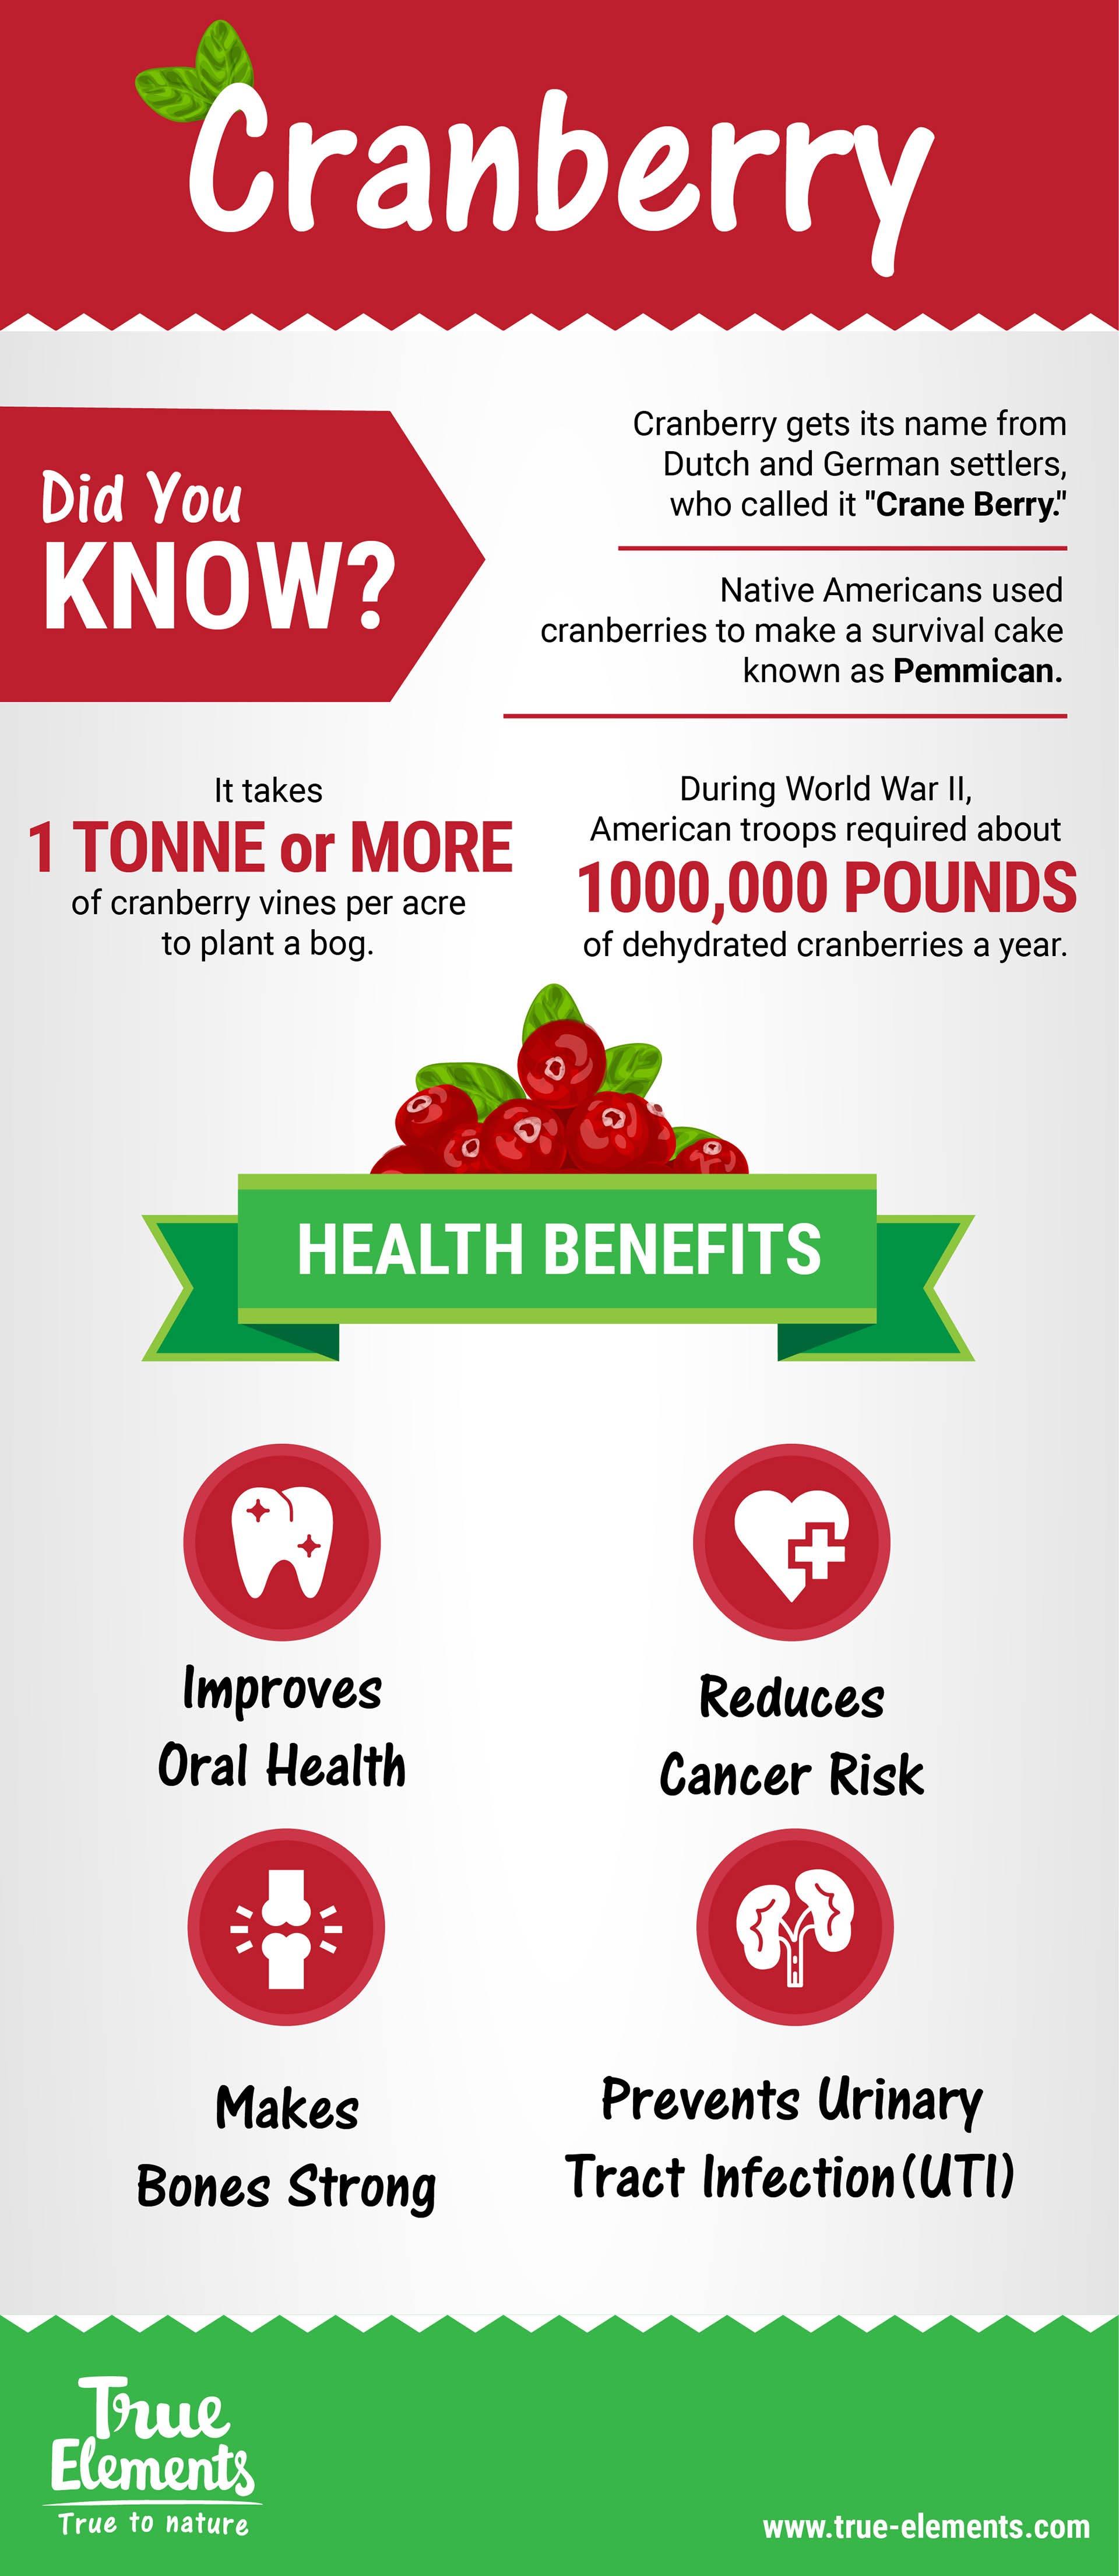 cranberry-health-benefits